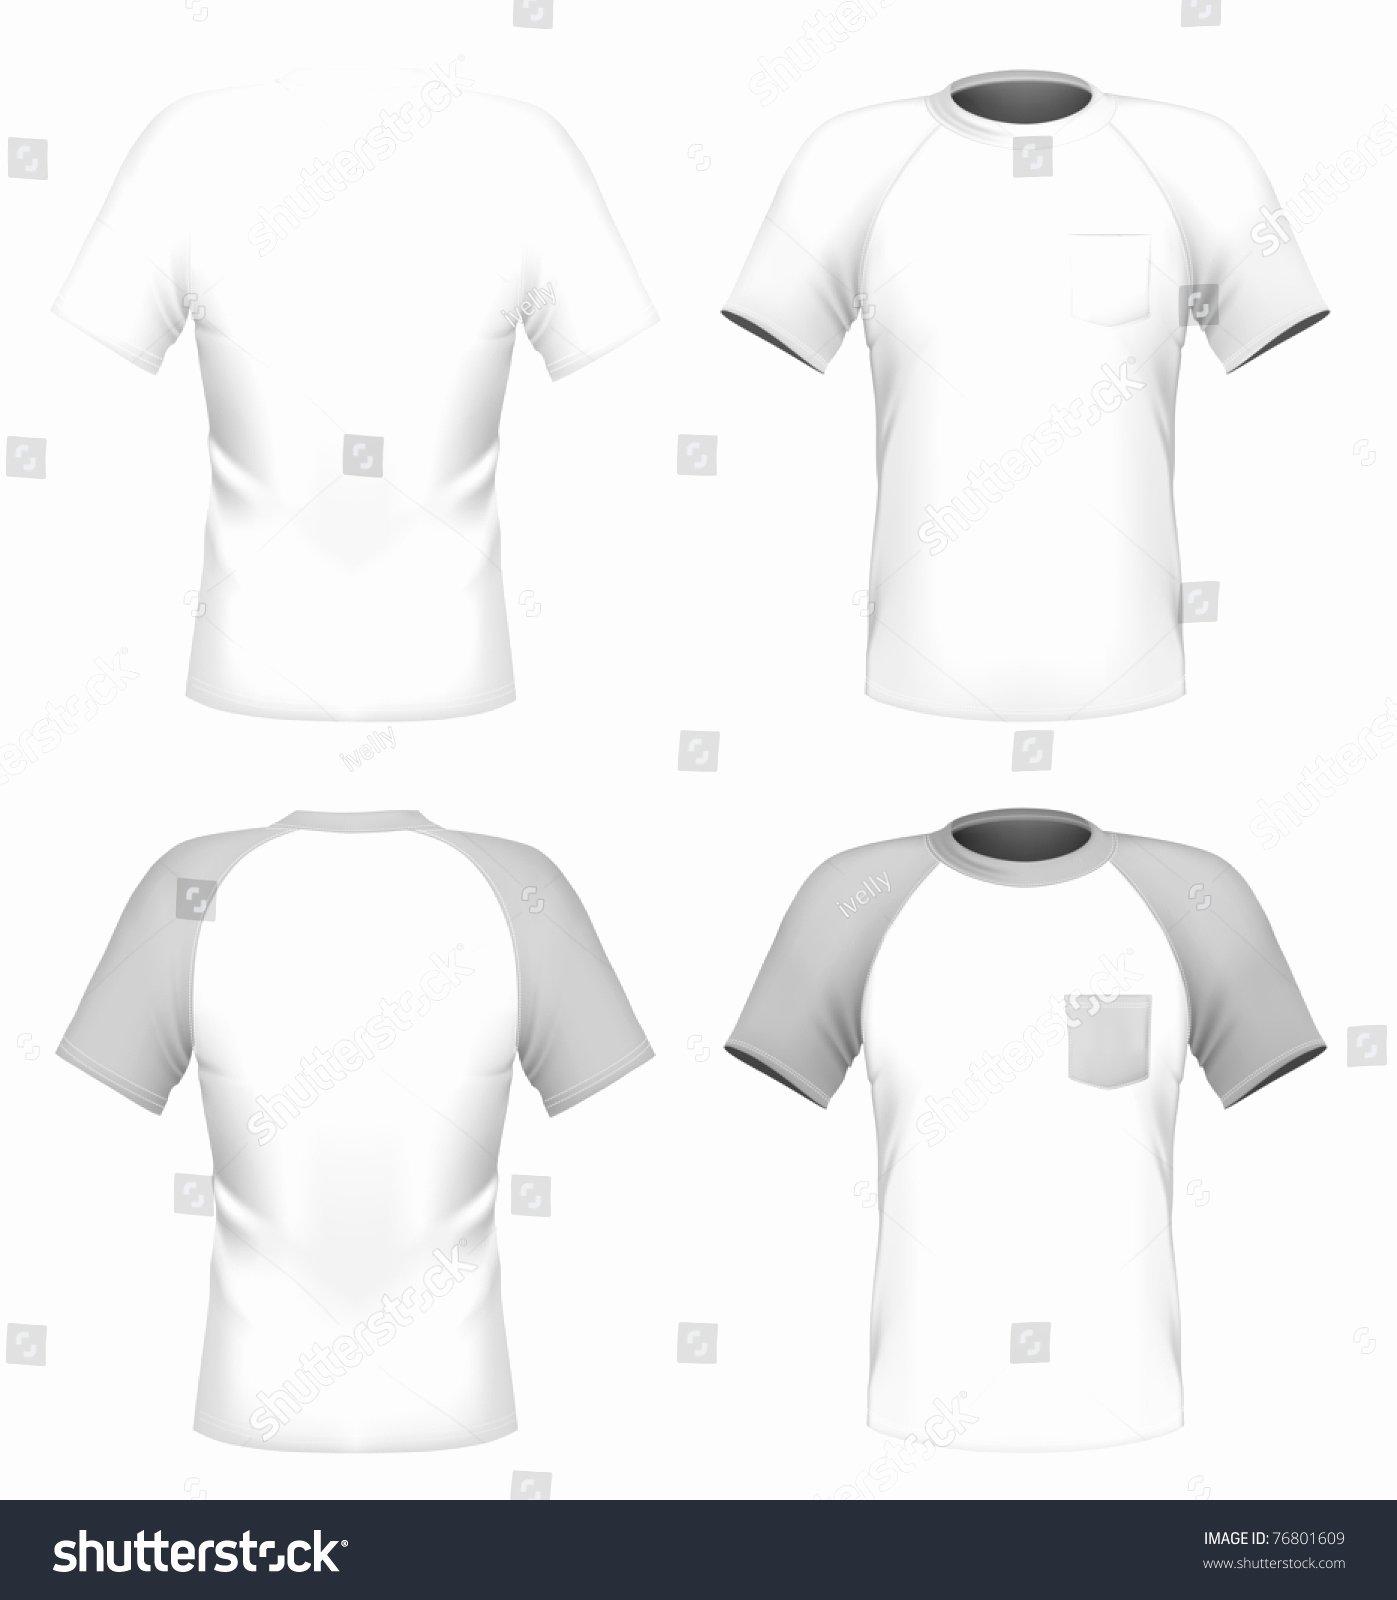 Pocket Shirt Template Fresh Vector Men S T Shirt Design Template with Pocket Front